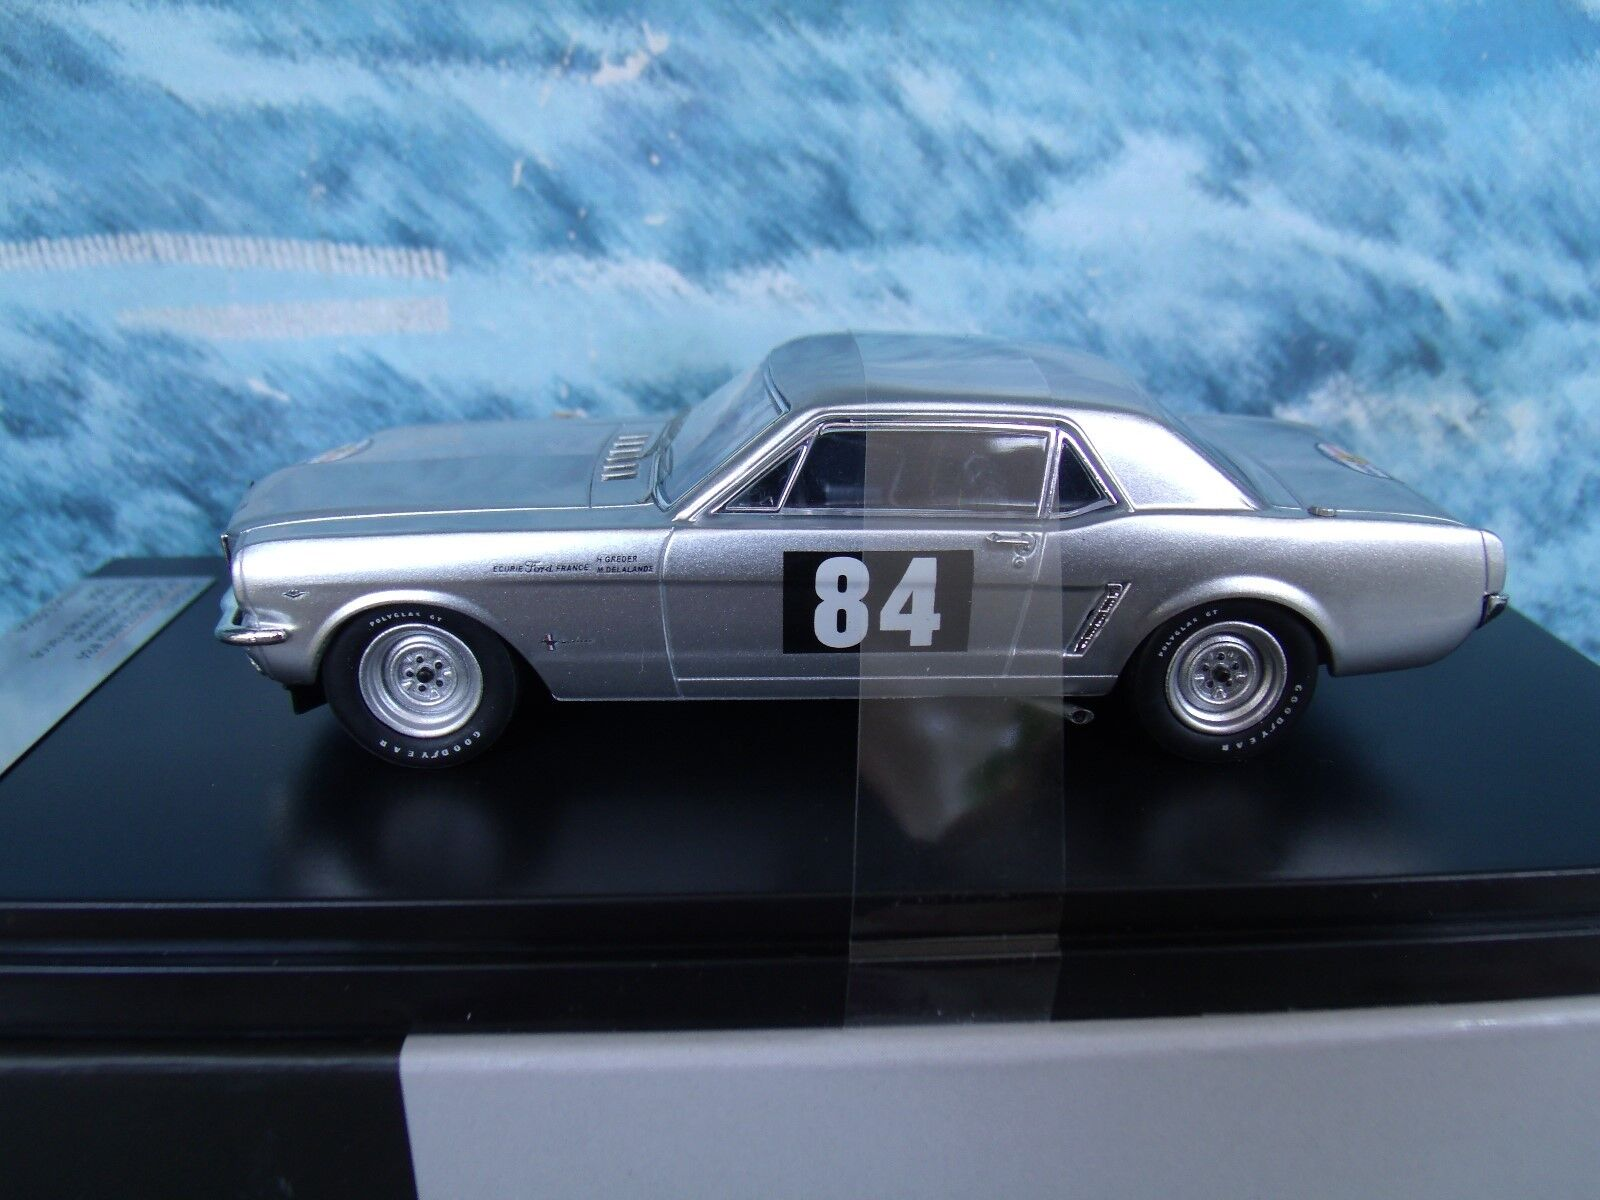 1 43 Premium X  Ford mustang  84 Tour De France 1964 Grougeer - Delalande